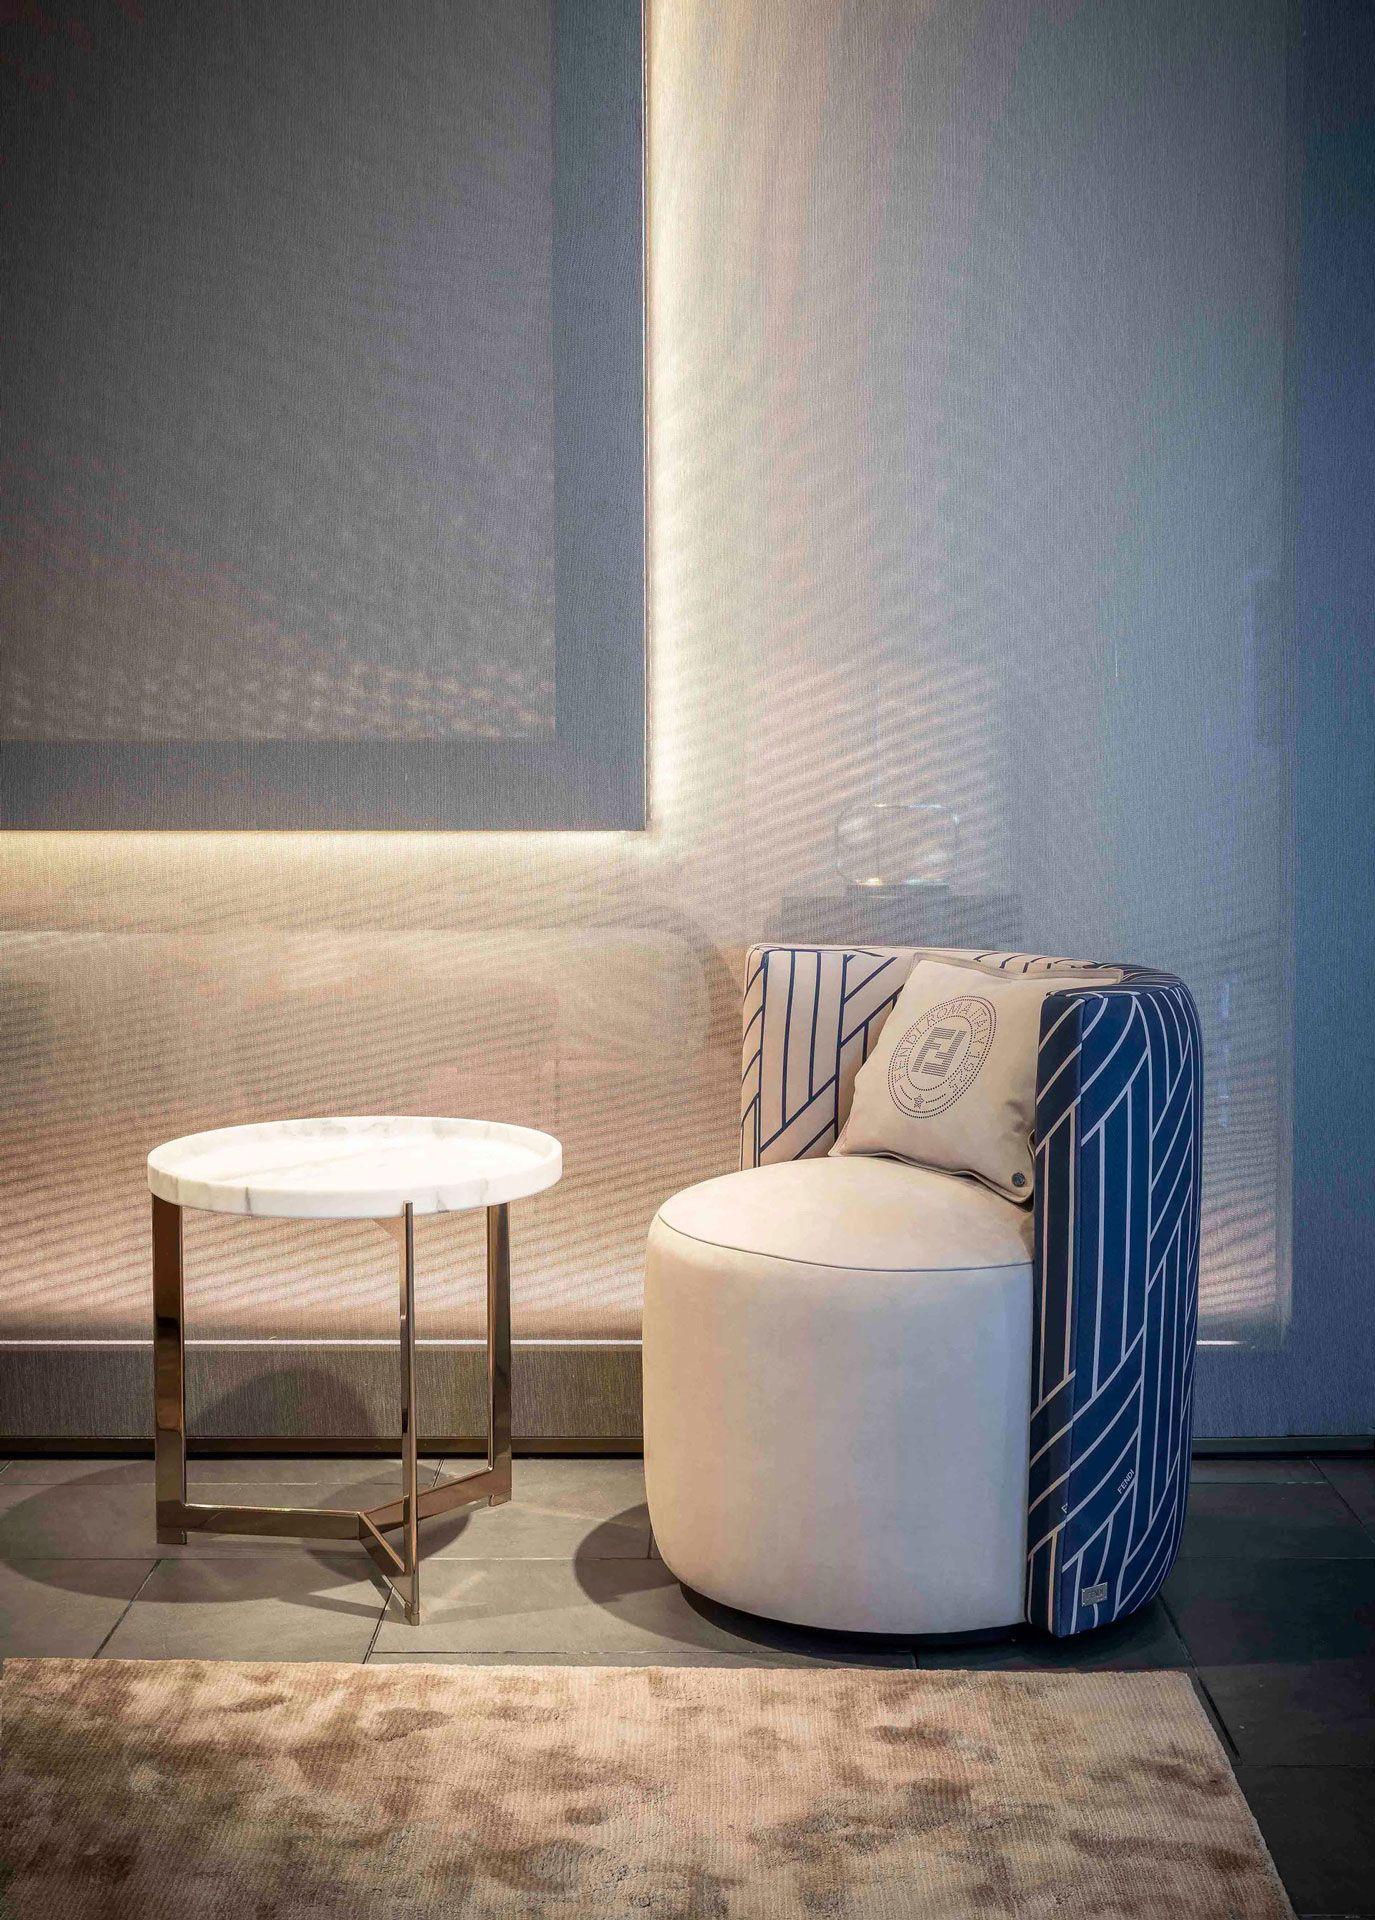 Luxury Living Luxury Italian Furniture Loulou Armchair By Fendicasa Celebrate Contemporary Designers Furniture Da Vinci Lifestyle In 2020 Luxury Italian Furniture Contemporary Furniture Design Italian Furniture